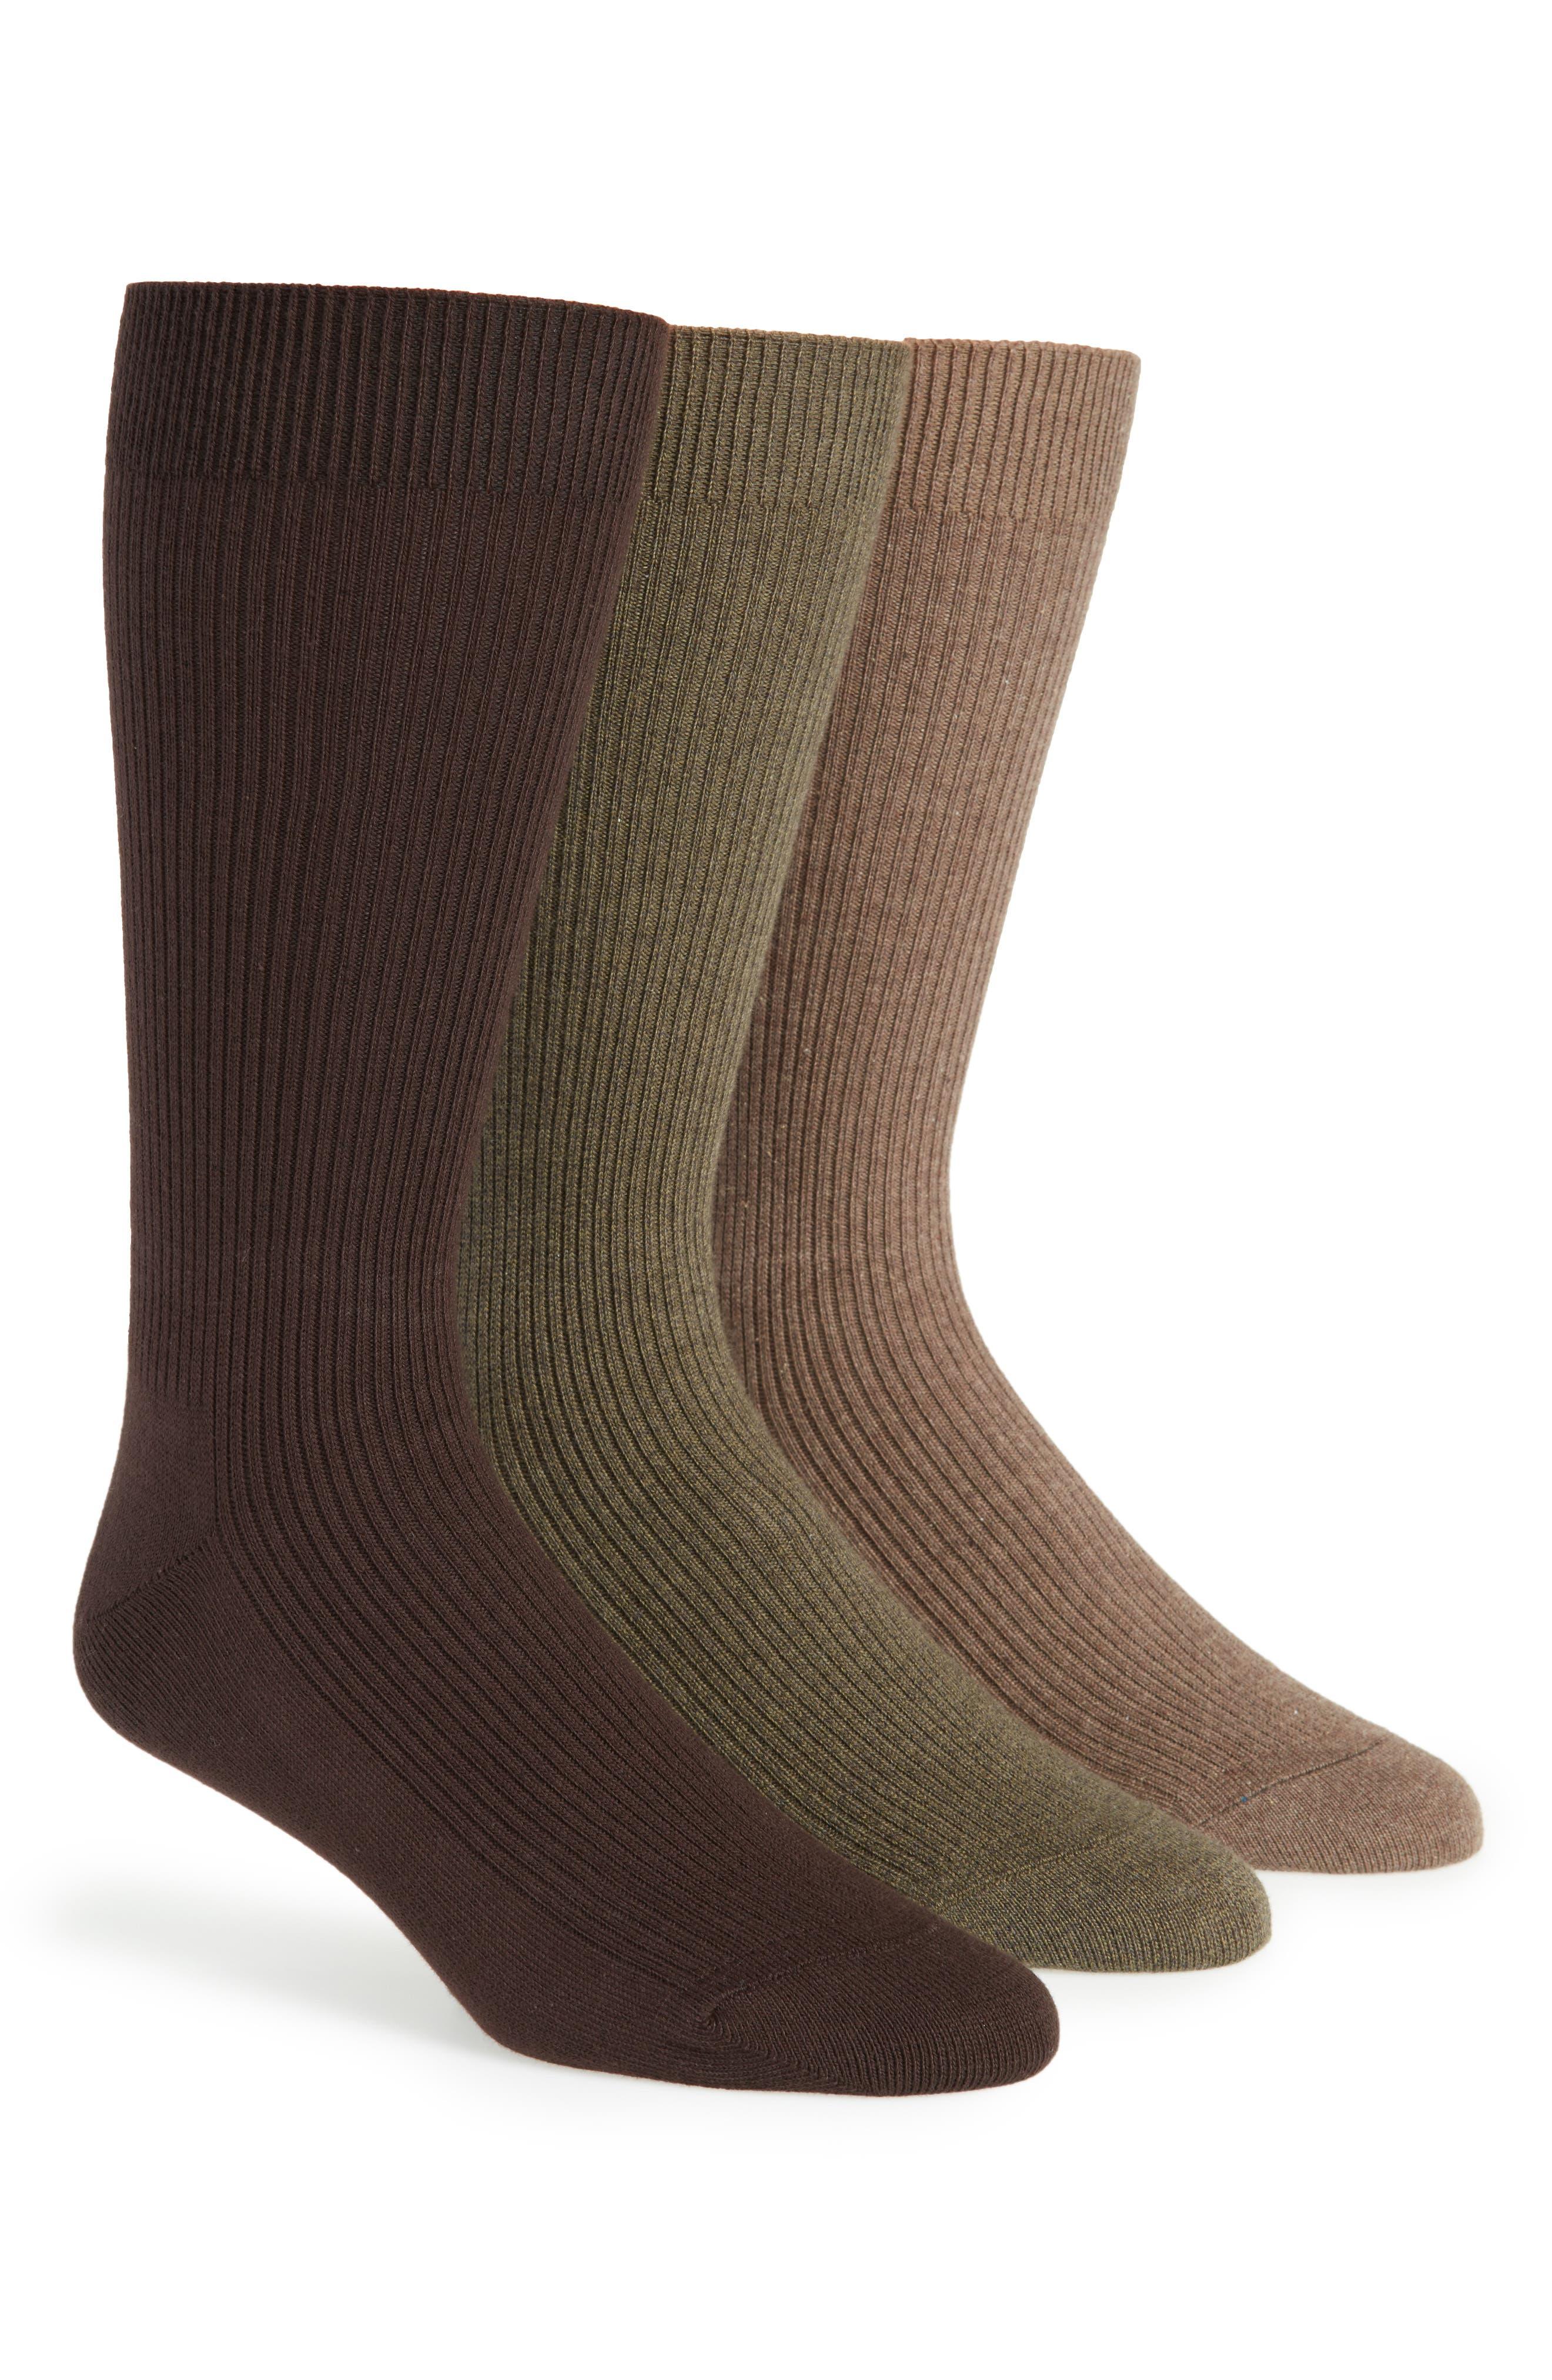 3-Pack Socks,                             Main thumbnail 4, color,